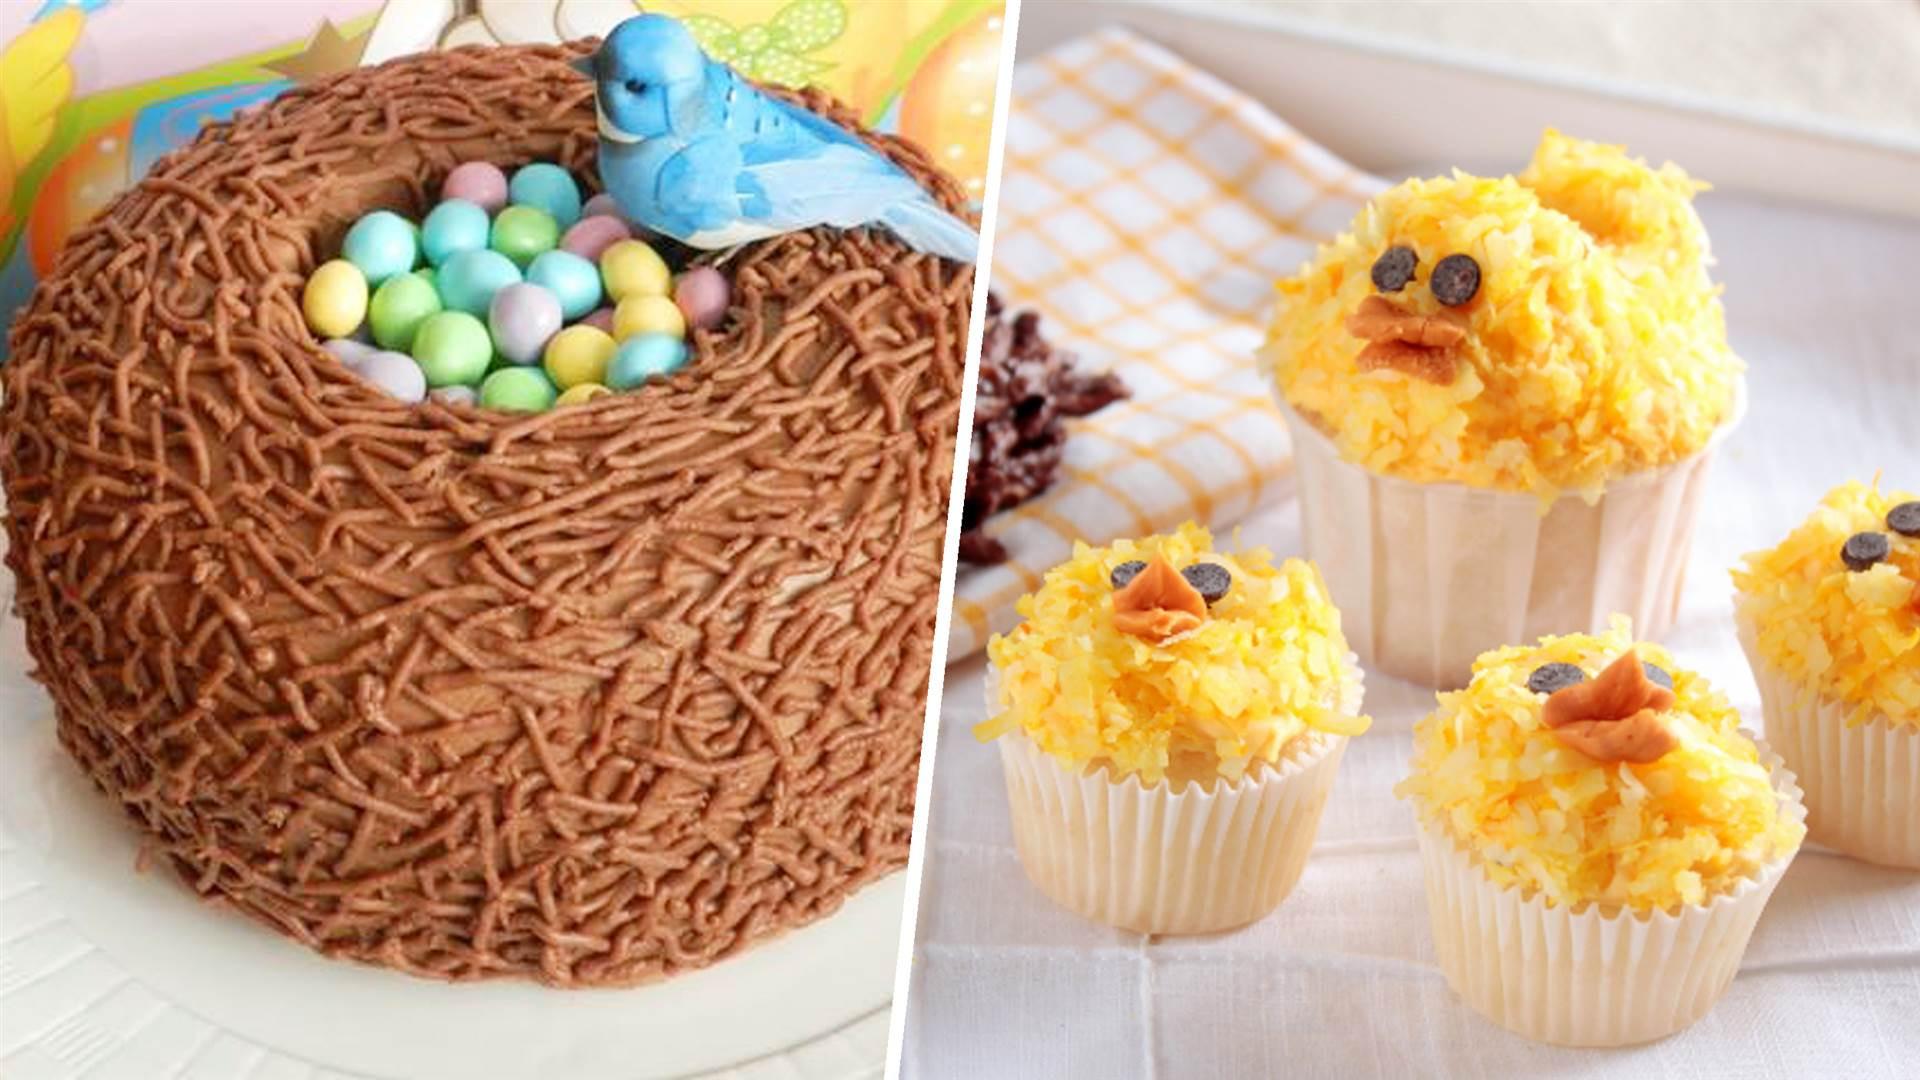 Easter Cake Easter Desserts  Easter Dessert Recipes TODAY